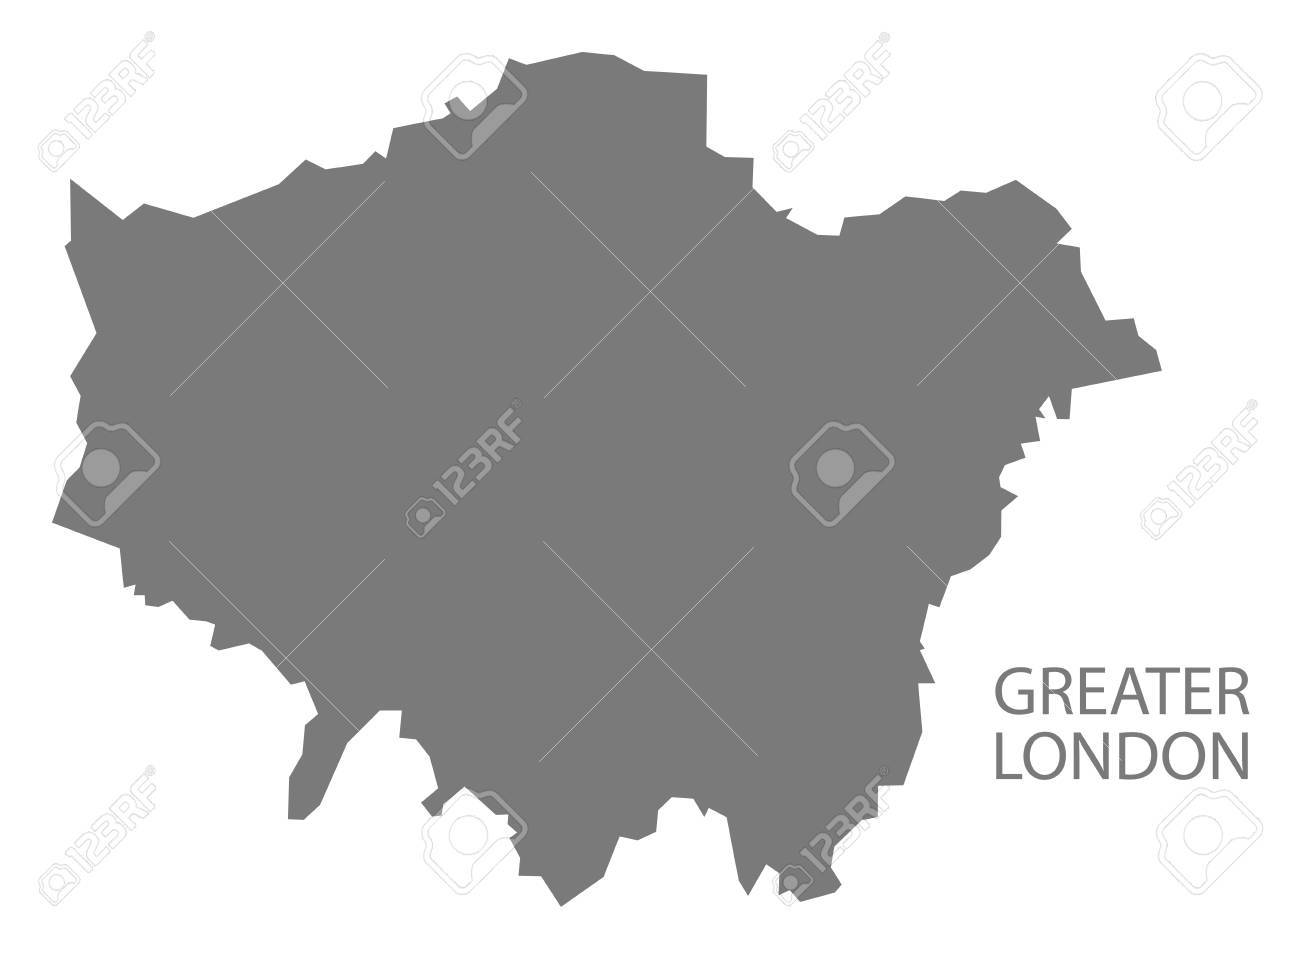 Greater London Administrative Area Map England Uk Grey Illustration